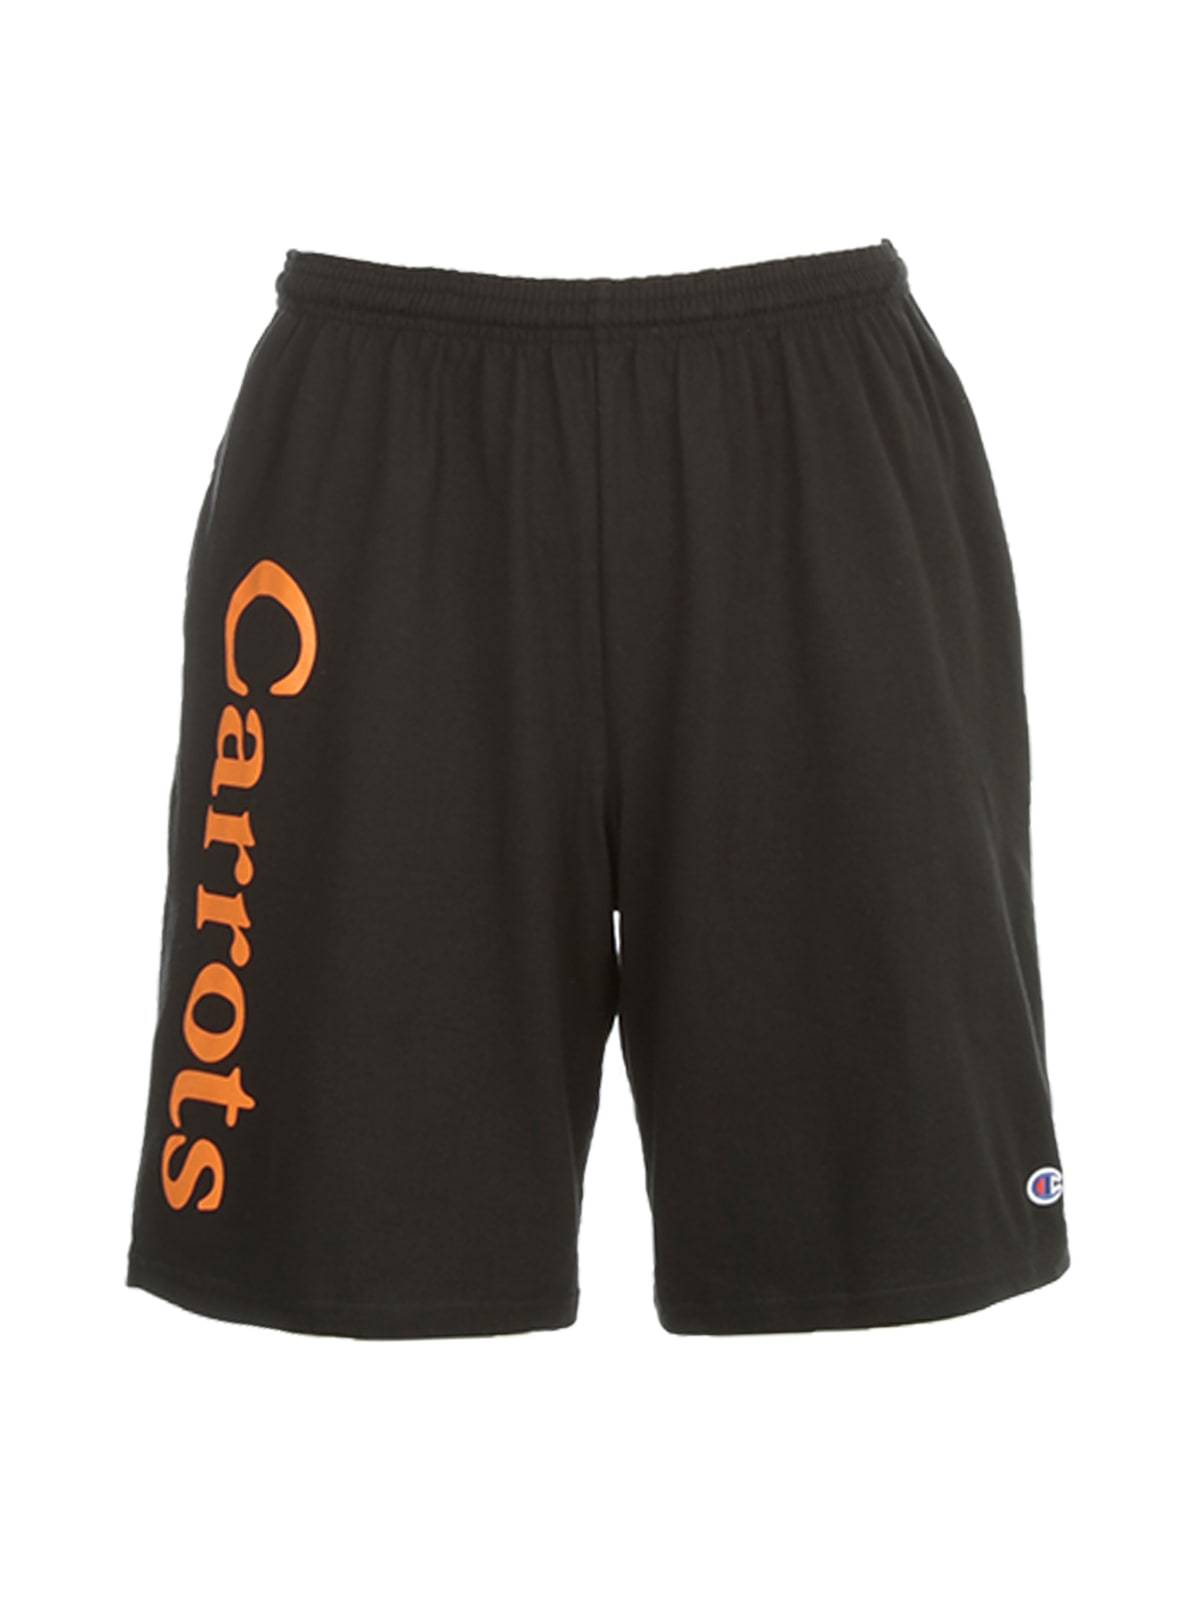 Cokane Rabbit Shorts